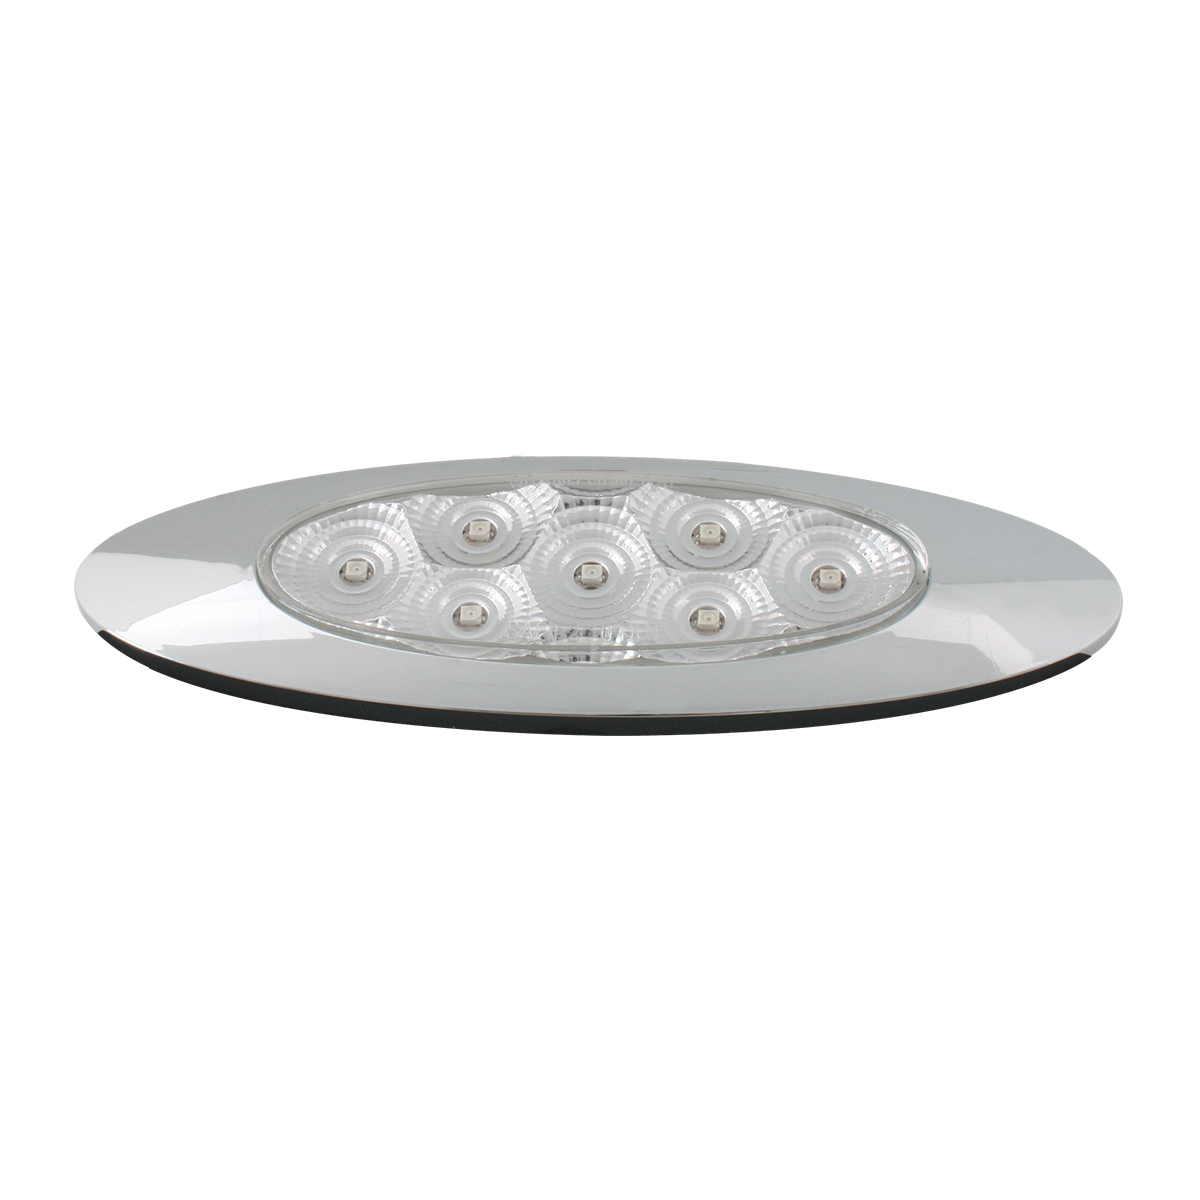 Ultra Thin Y2K Spyder LED Light in Clear Lens